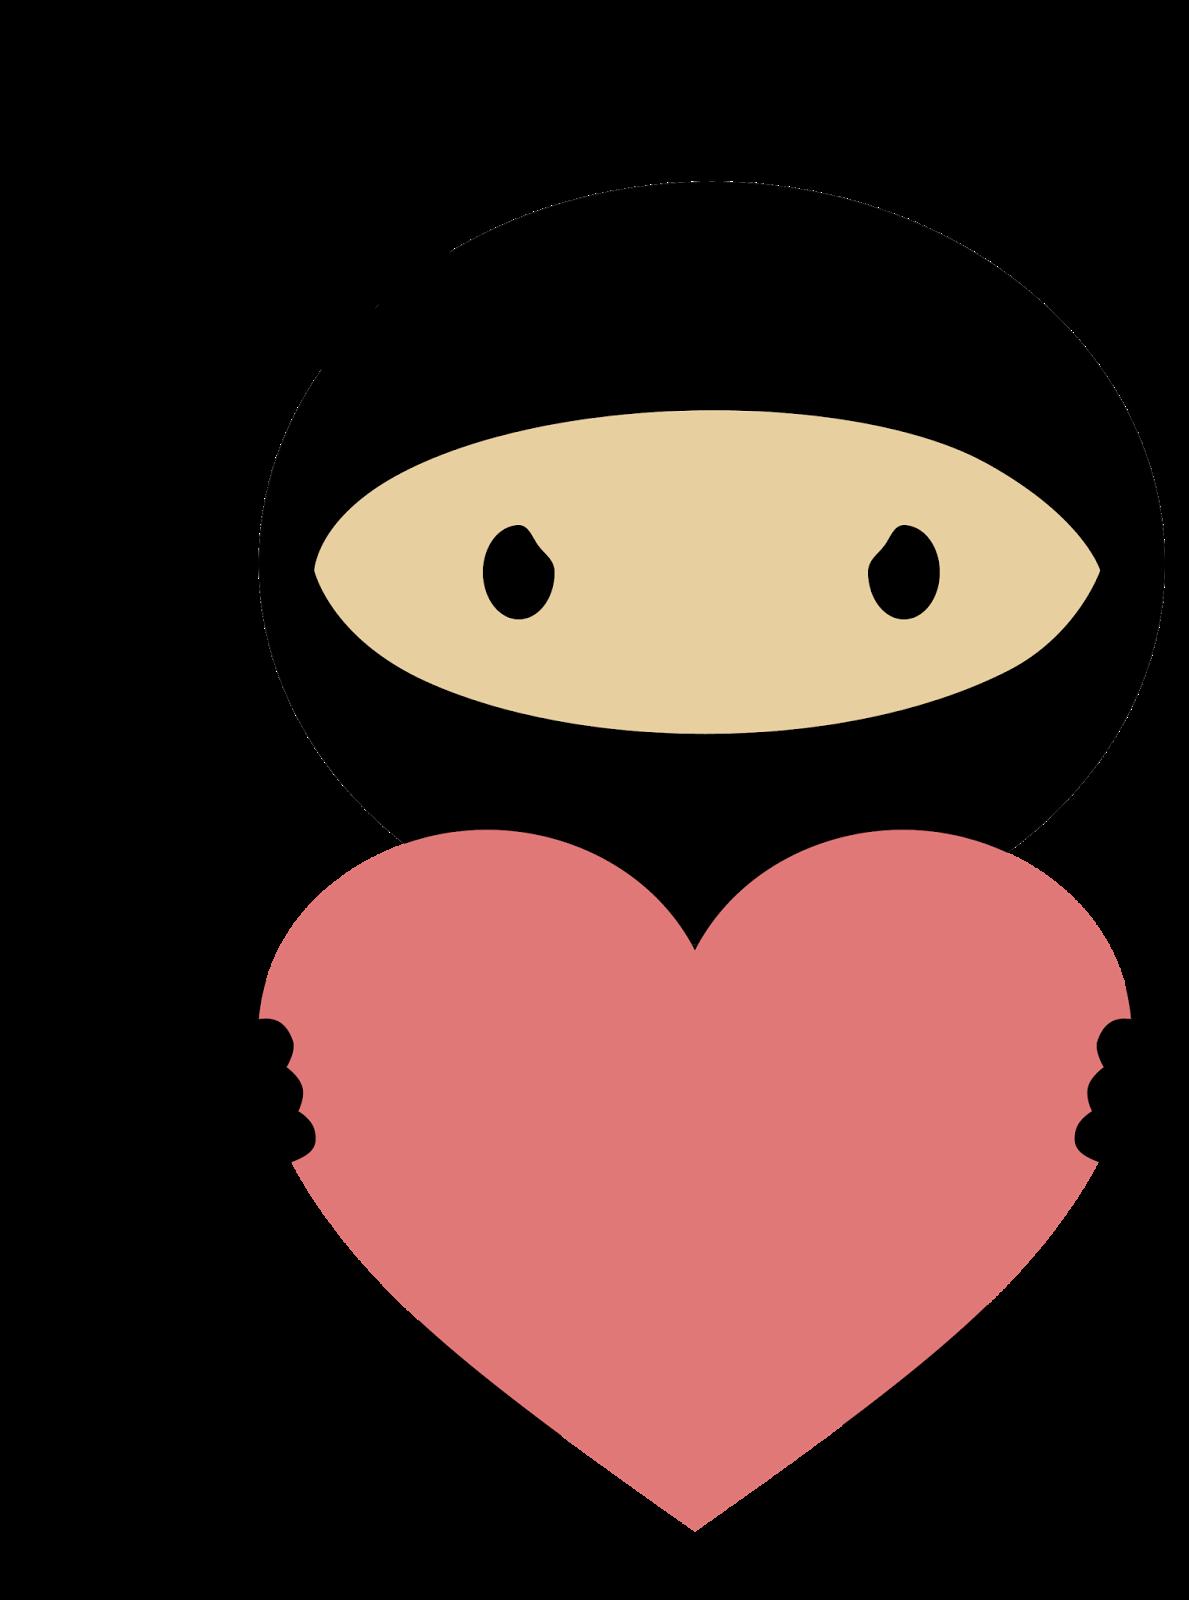 Ninja In Love Clipart Oh My Fiesta For Geeks